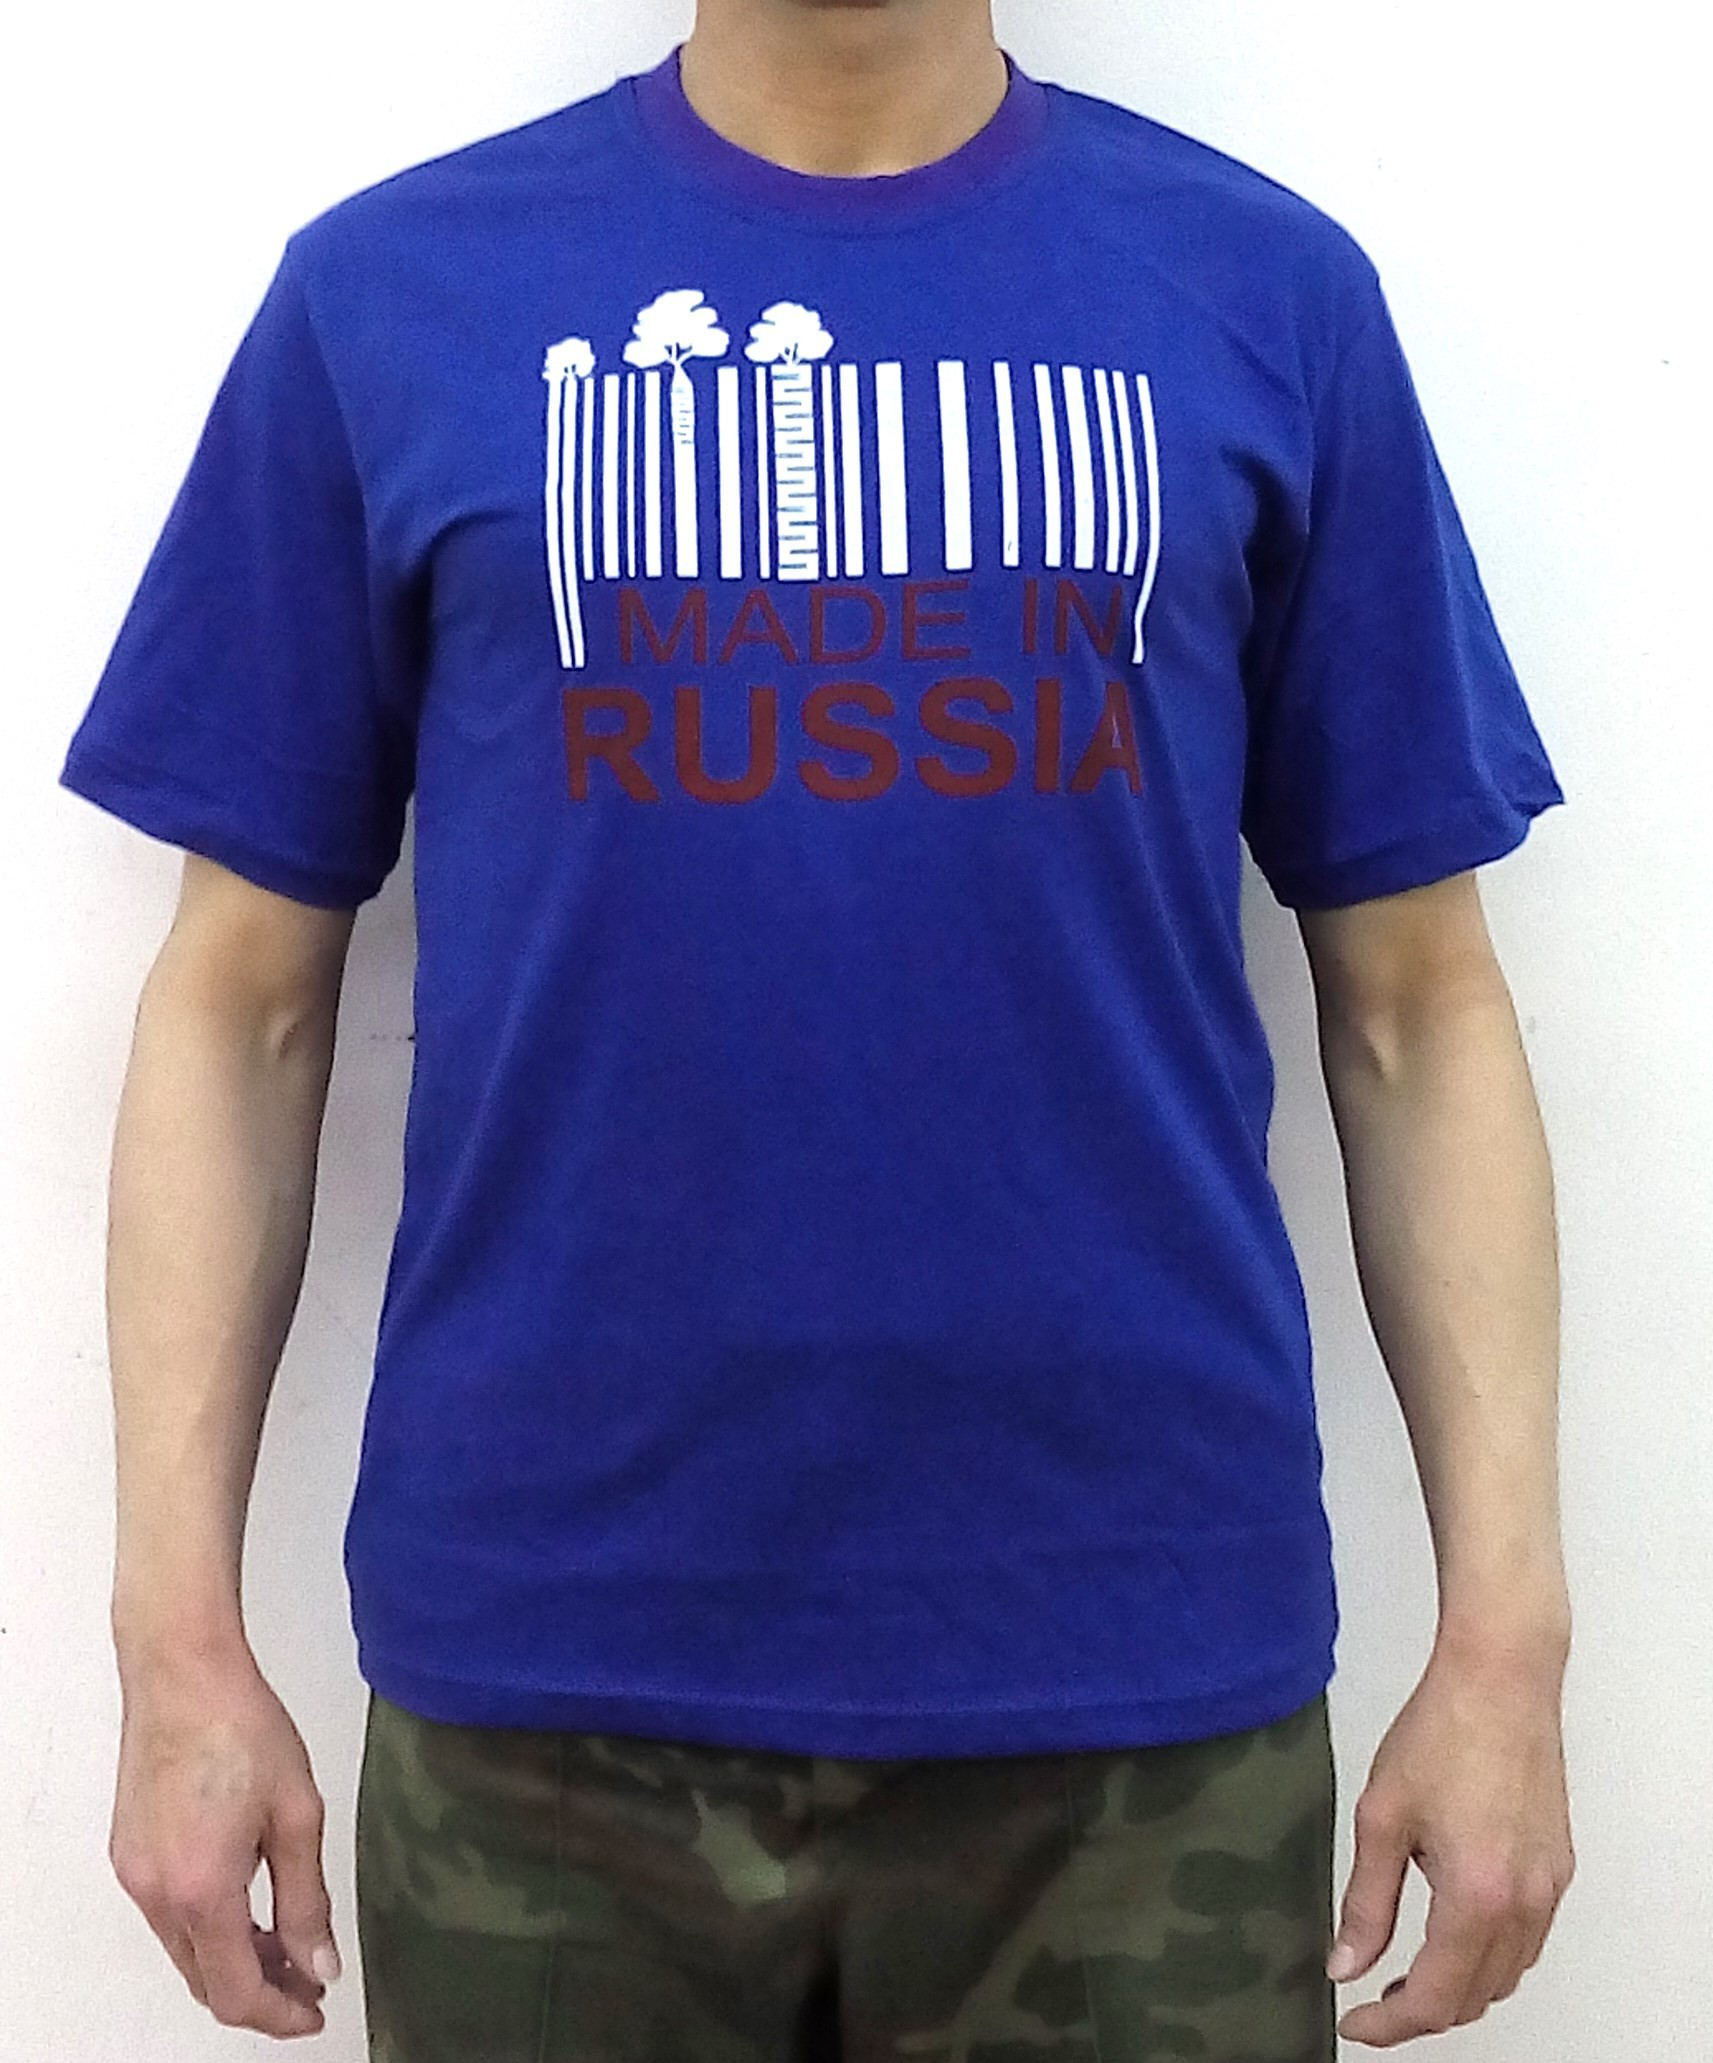 Футболка мужская RussiaФутболки<br><br><br>Размер: 50